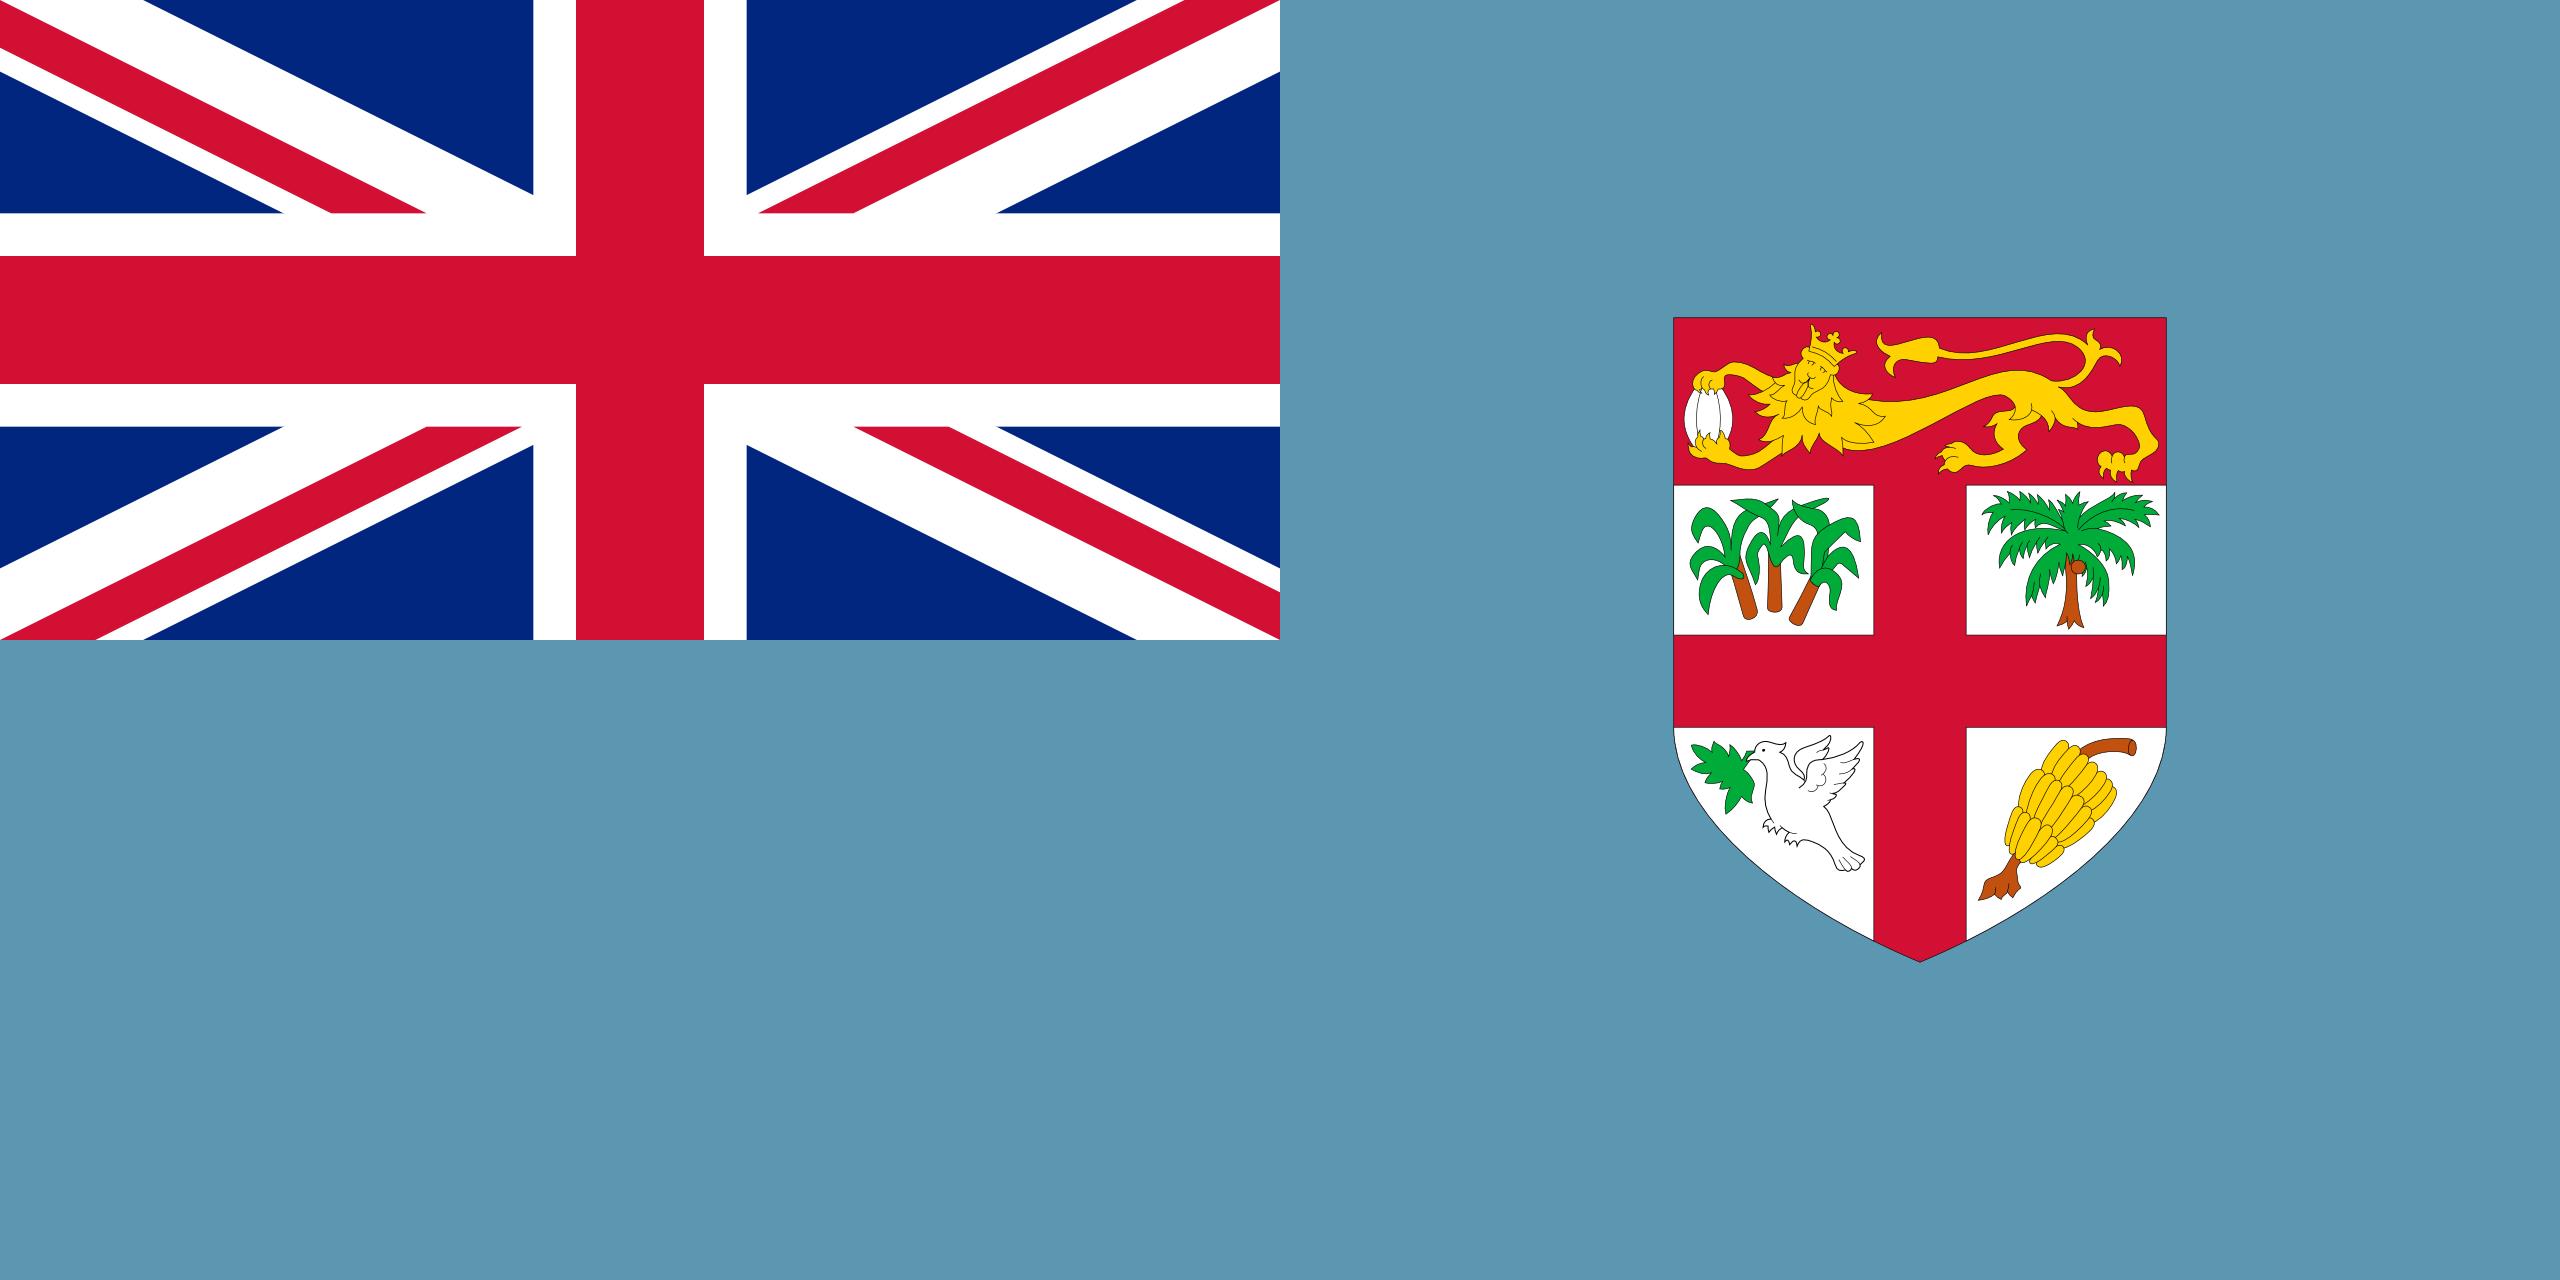 fiyi, paese, emblema, logo, simbolo - Sfondi HD - Professor-falken.com